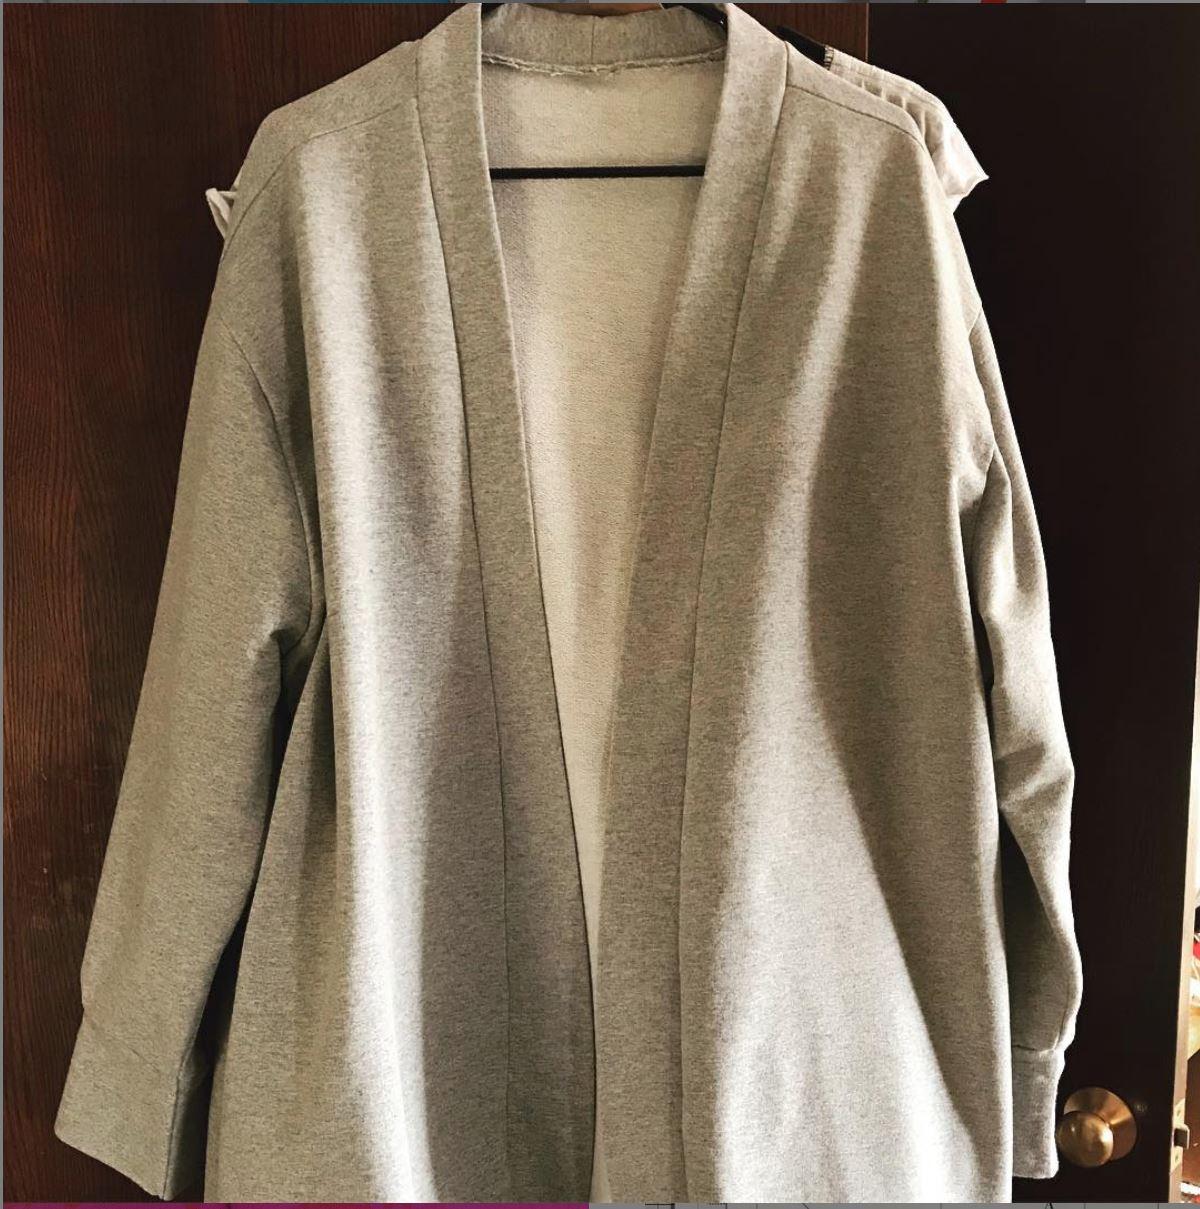 Grey long sleeved cardigan